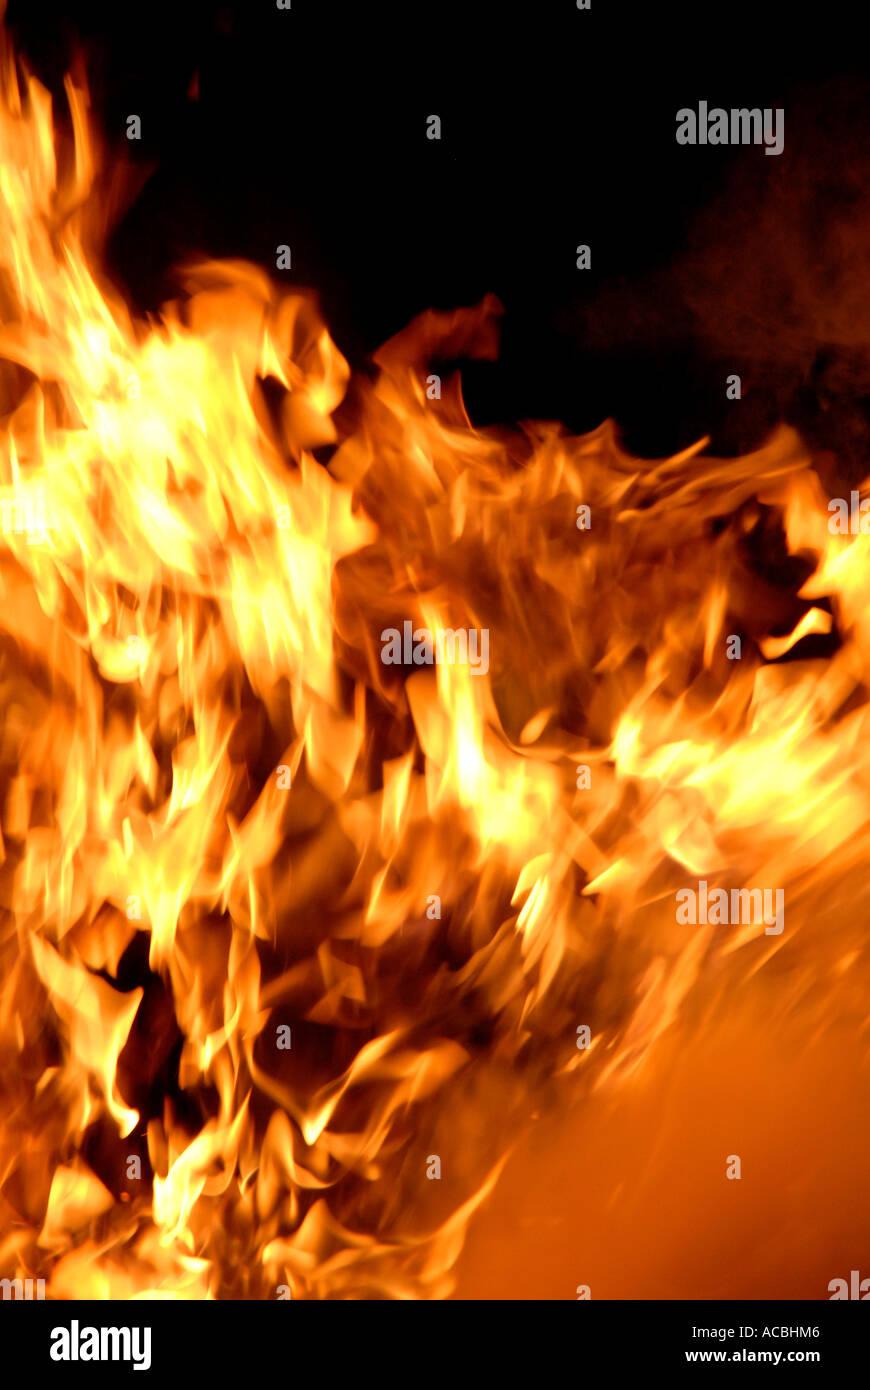 Flame fire intense burning - Stock Image